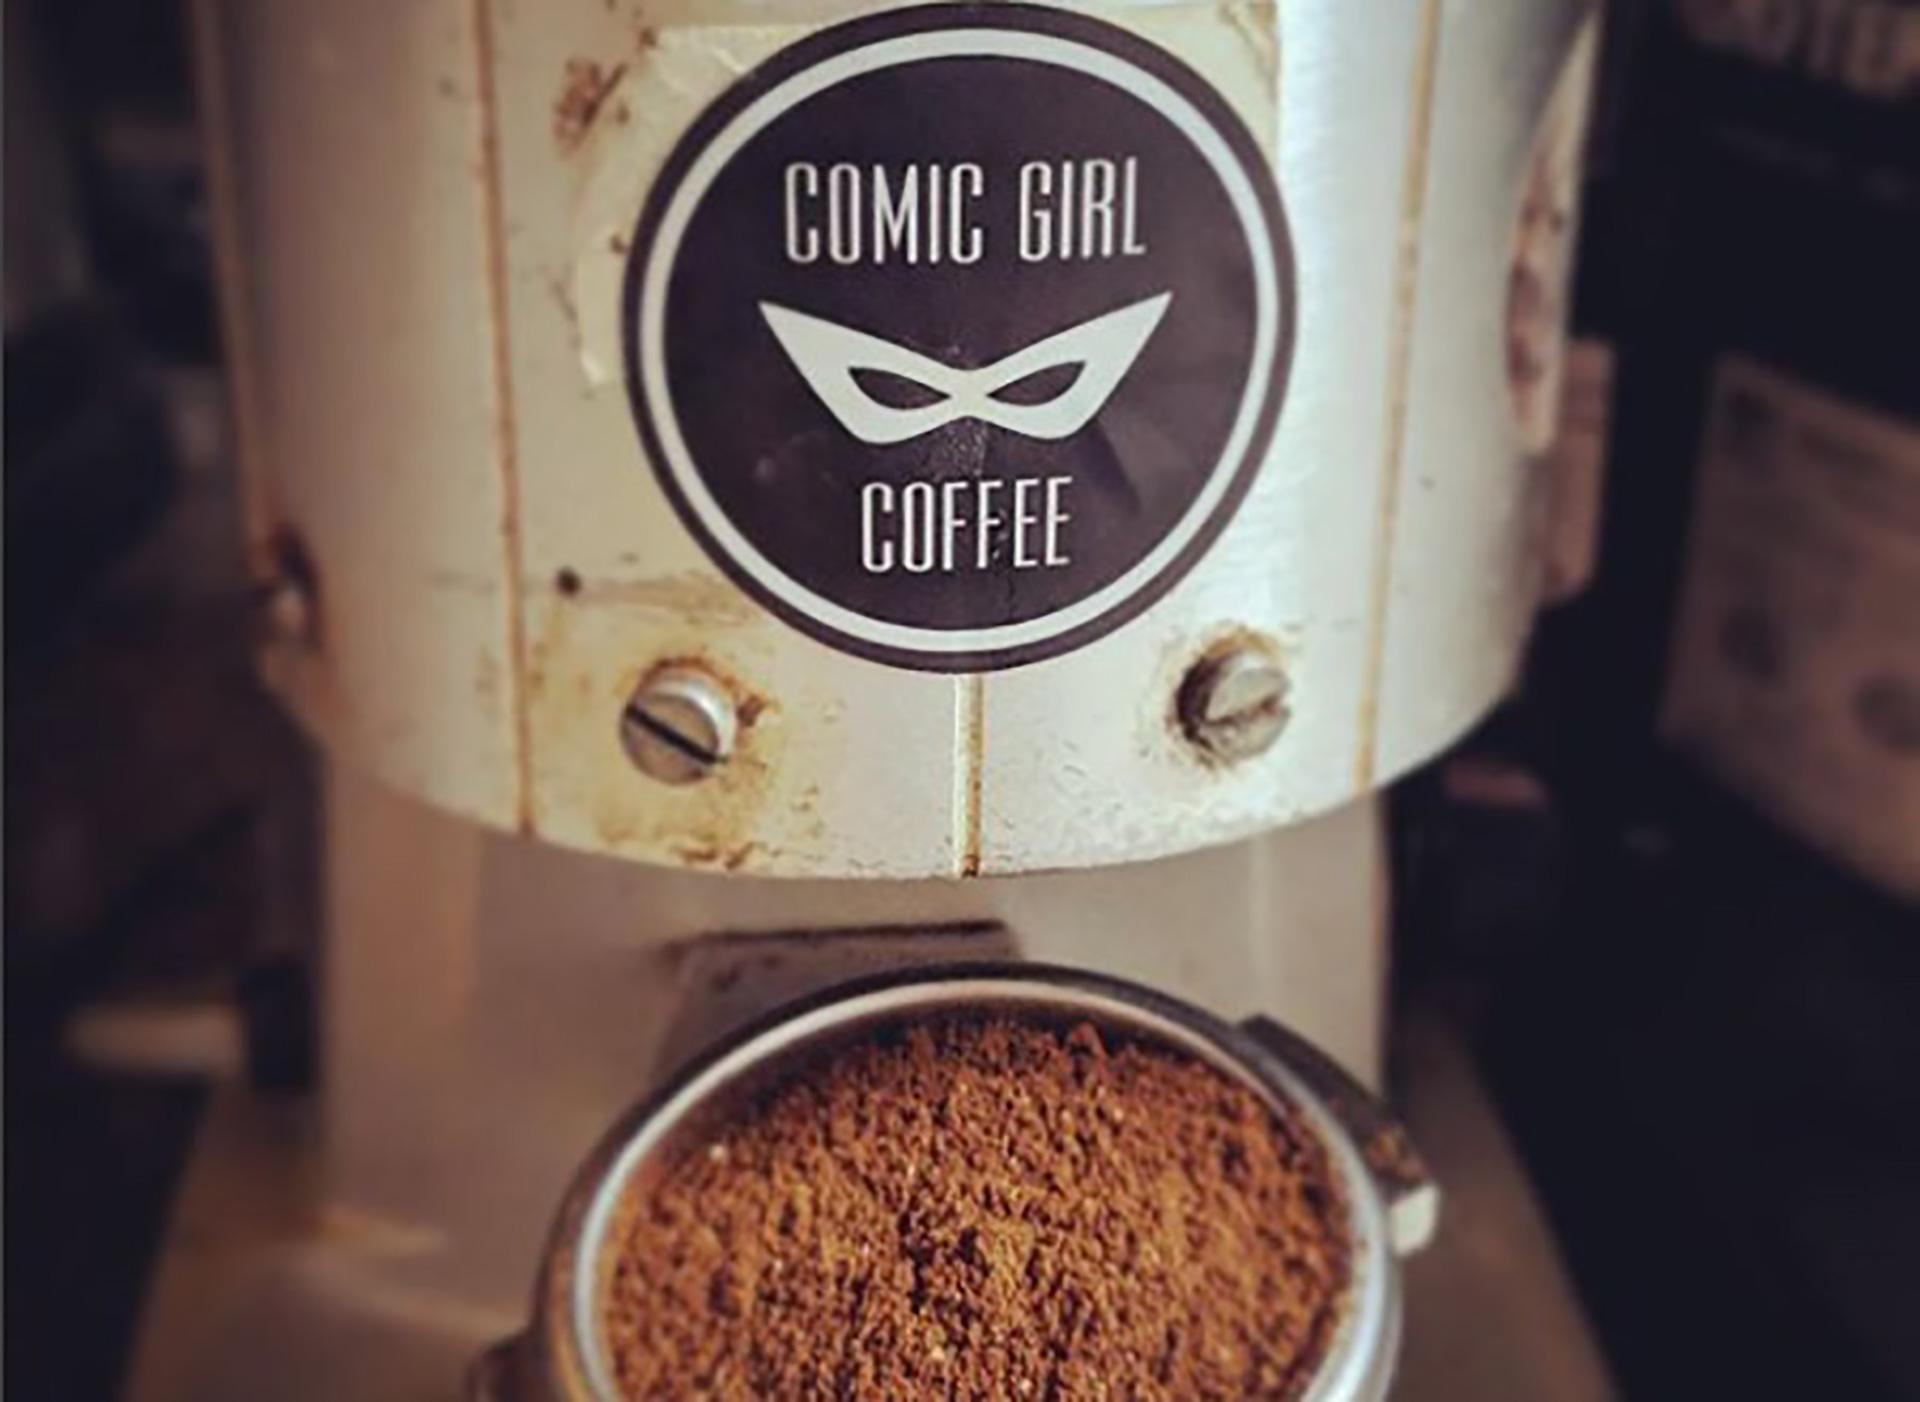 Boom! Pow! Charlotte's Comic Girl Coffee Fights For Inclusivity photo